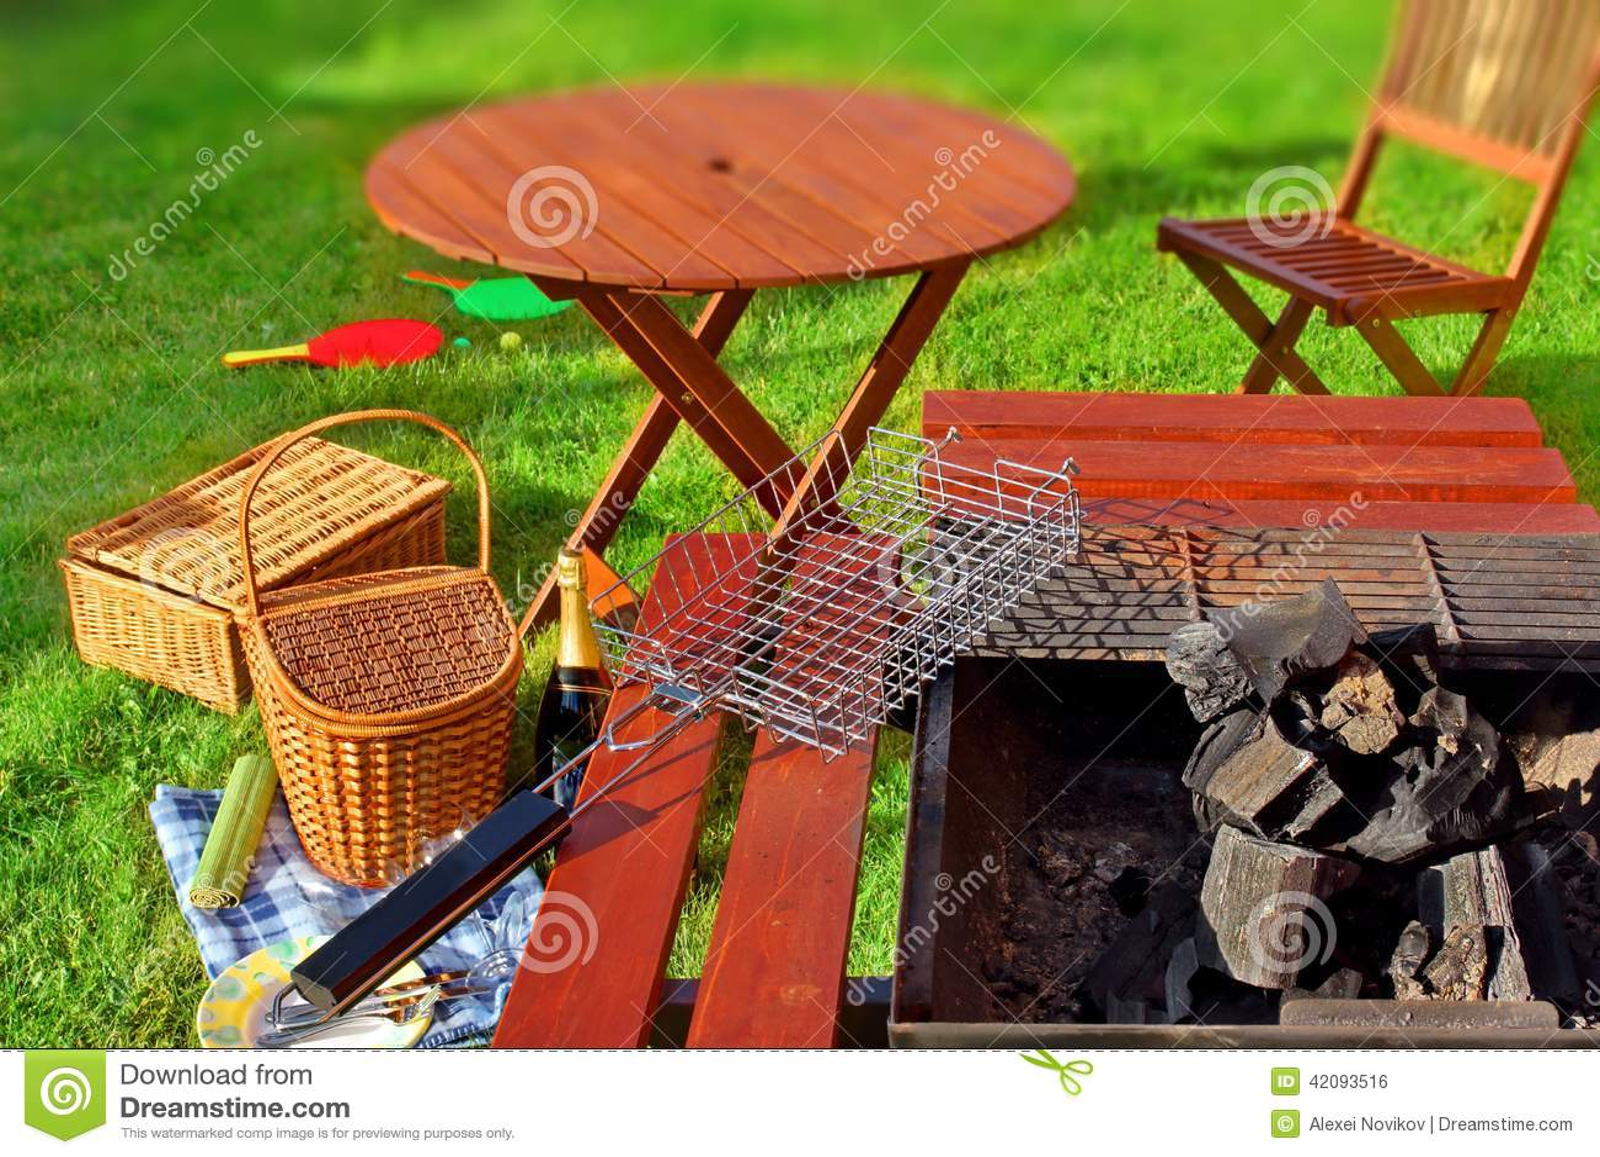 Backyard Summer Background : Summer BBQ Party or Picnic scene in backyard on lawn Tiltshift